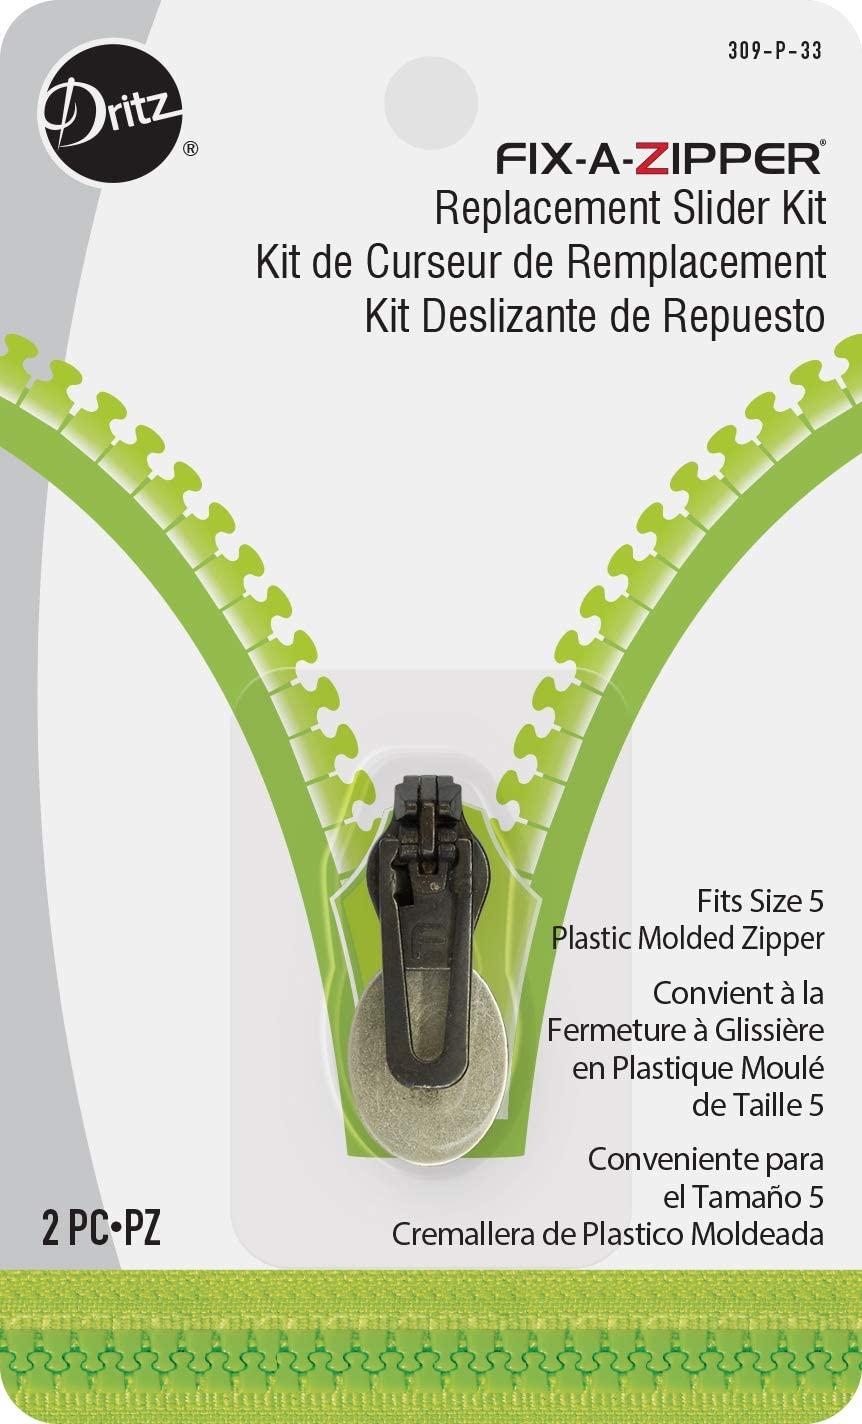 Dritz 309-P-33 Fix-A-Zipper Replacement Slider Kit for Size 5 Plastic Zipper, Gunmetal